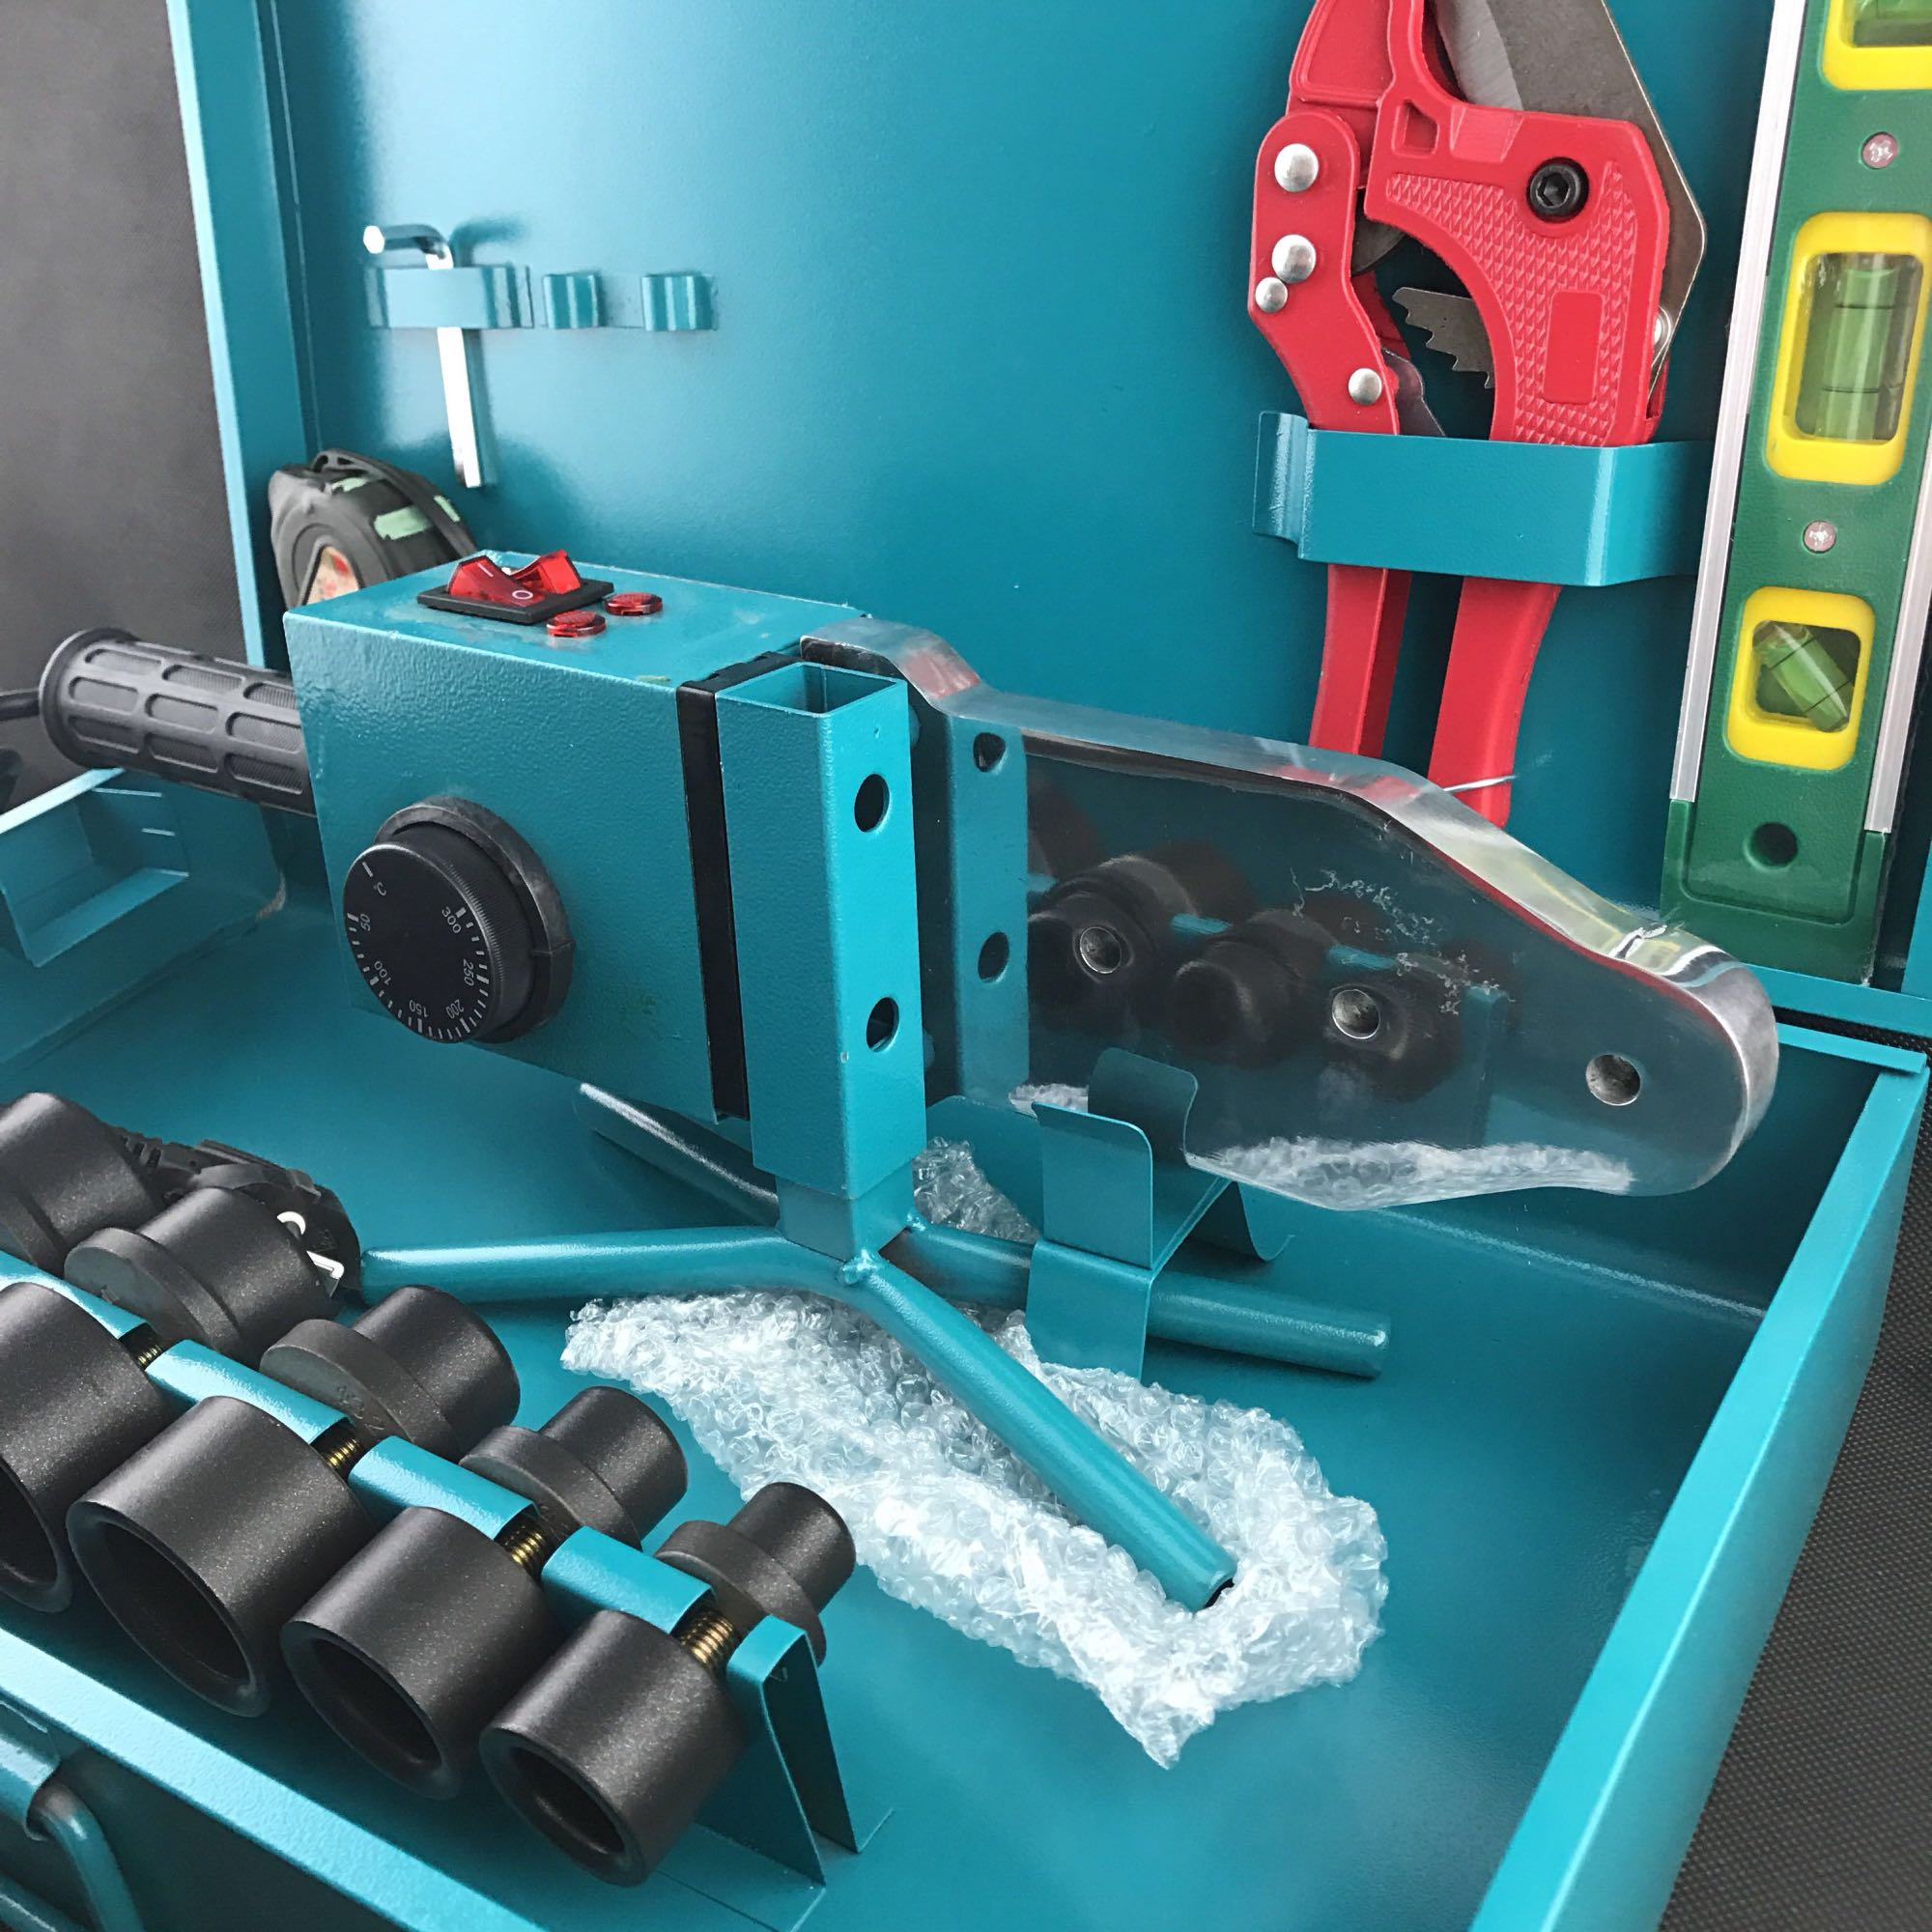 Grade A New PPR Welding Machine, Plastic Pipe Welding Machine Water Tube Welder AC 220V 1500W 20-63mm To Use